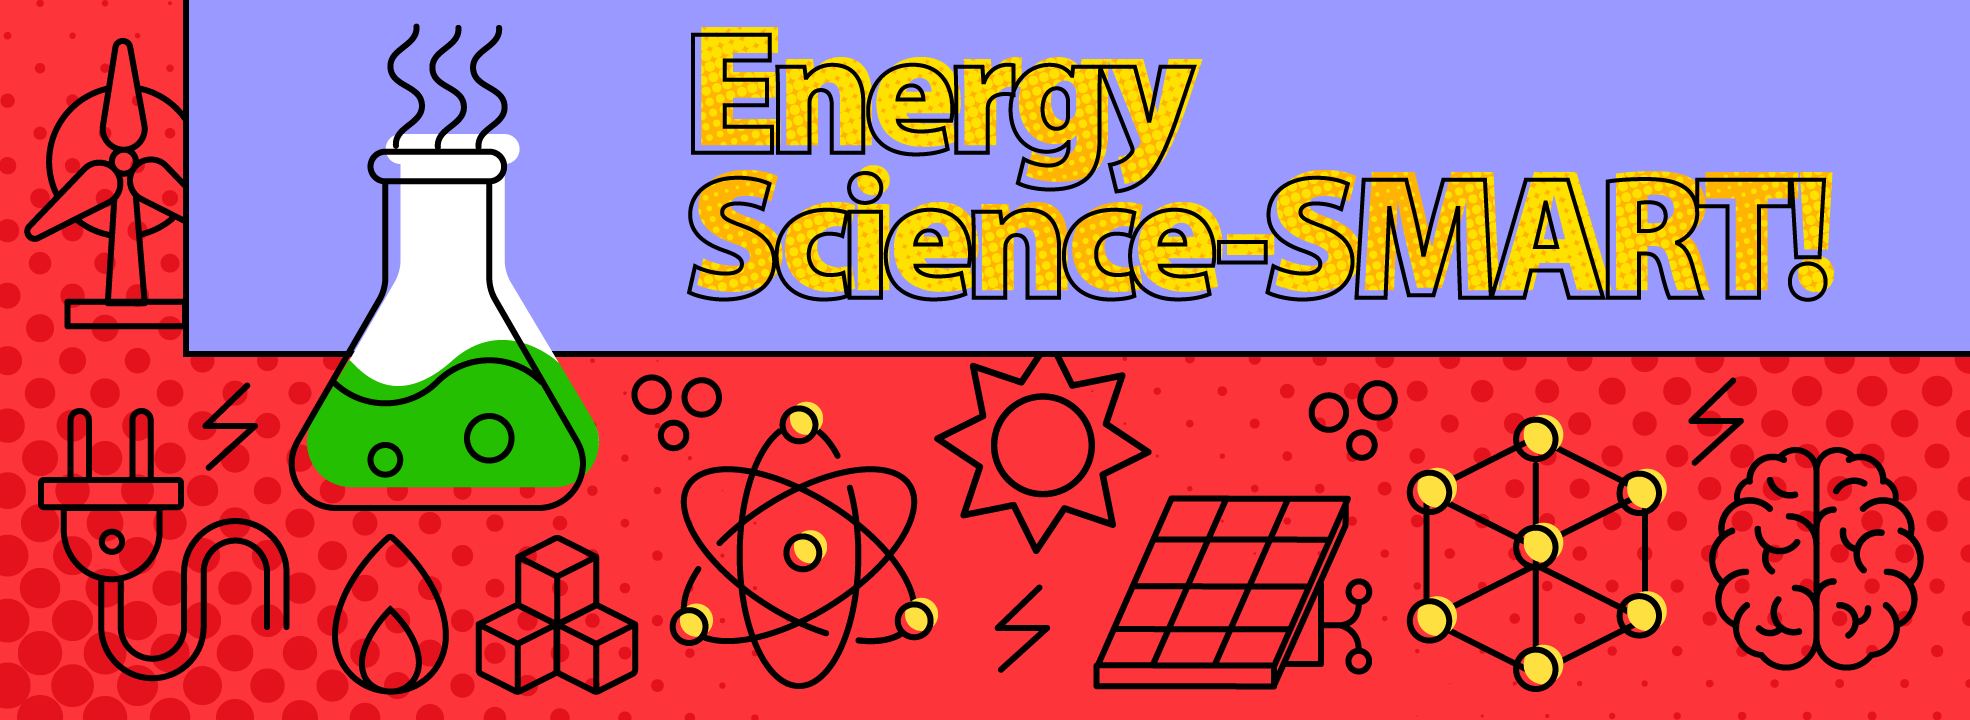 Energy Science-SMART!